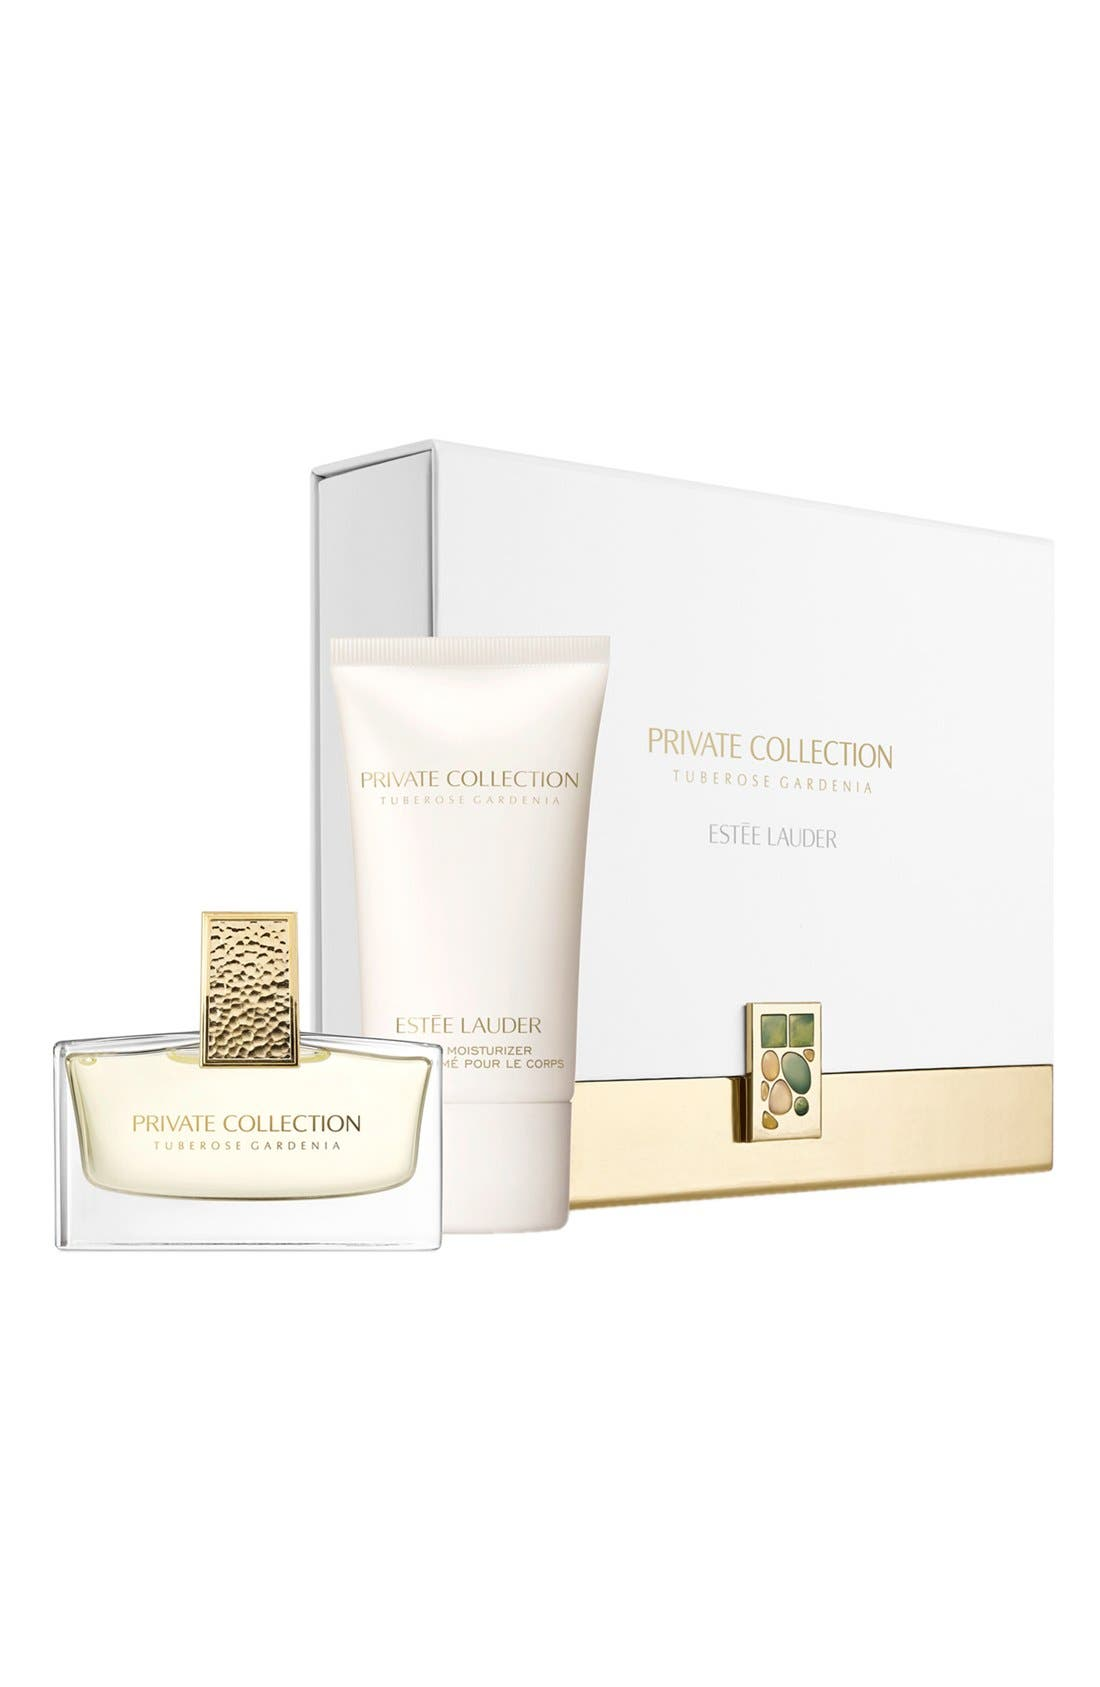 Estée Lauder 'Private Collection - Tuberose Gardenia' Duo (Limited Edition) ($117 Value)